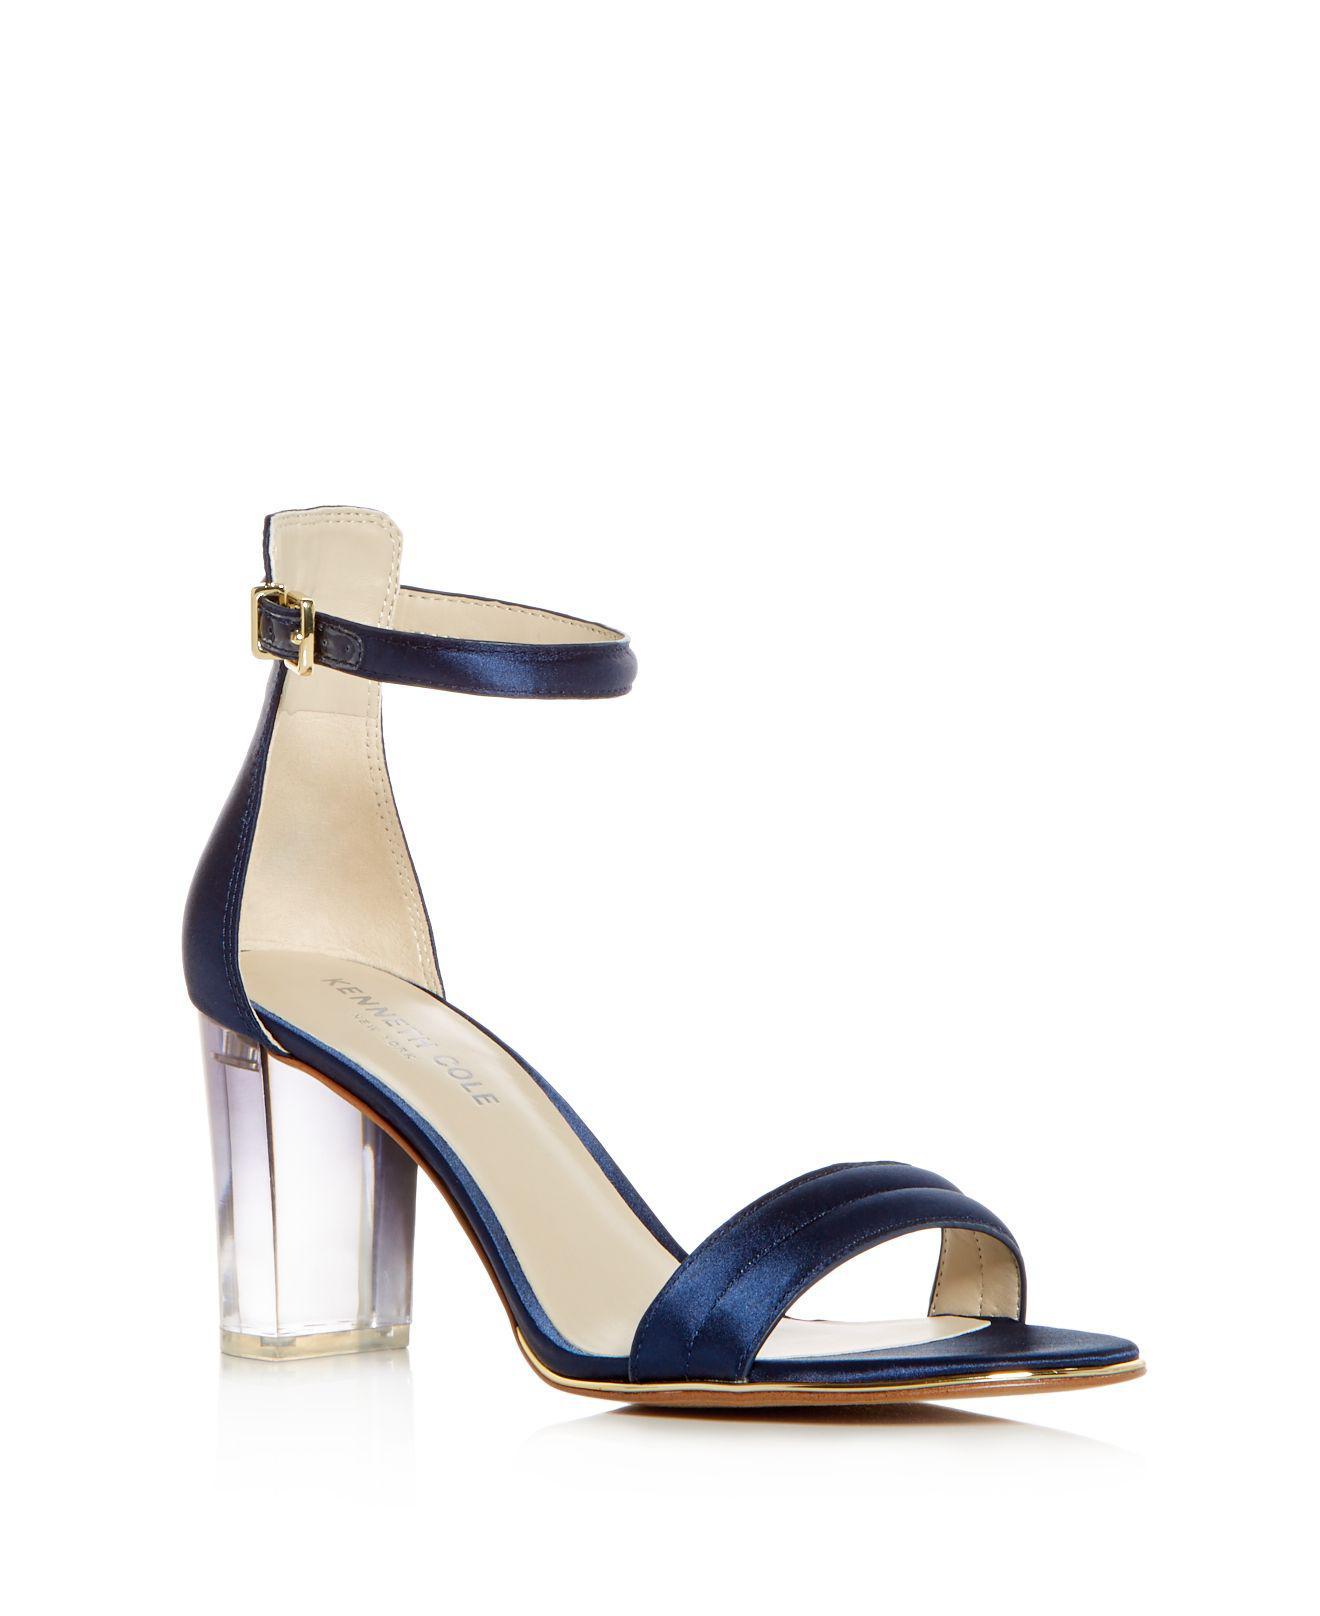 Kenneth Cole Women's Lex Satin Ankle Strap High-Heel Sandals Eweexi3oT